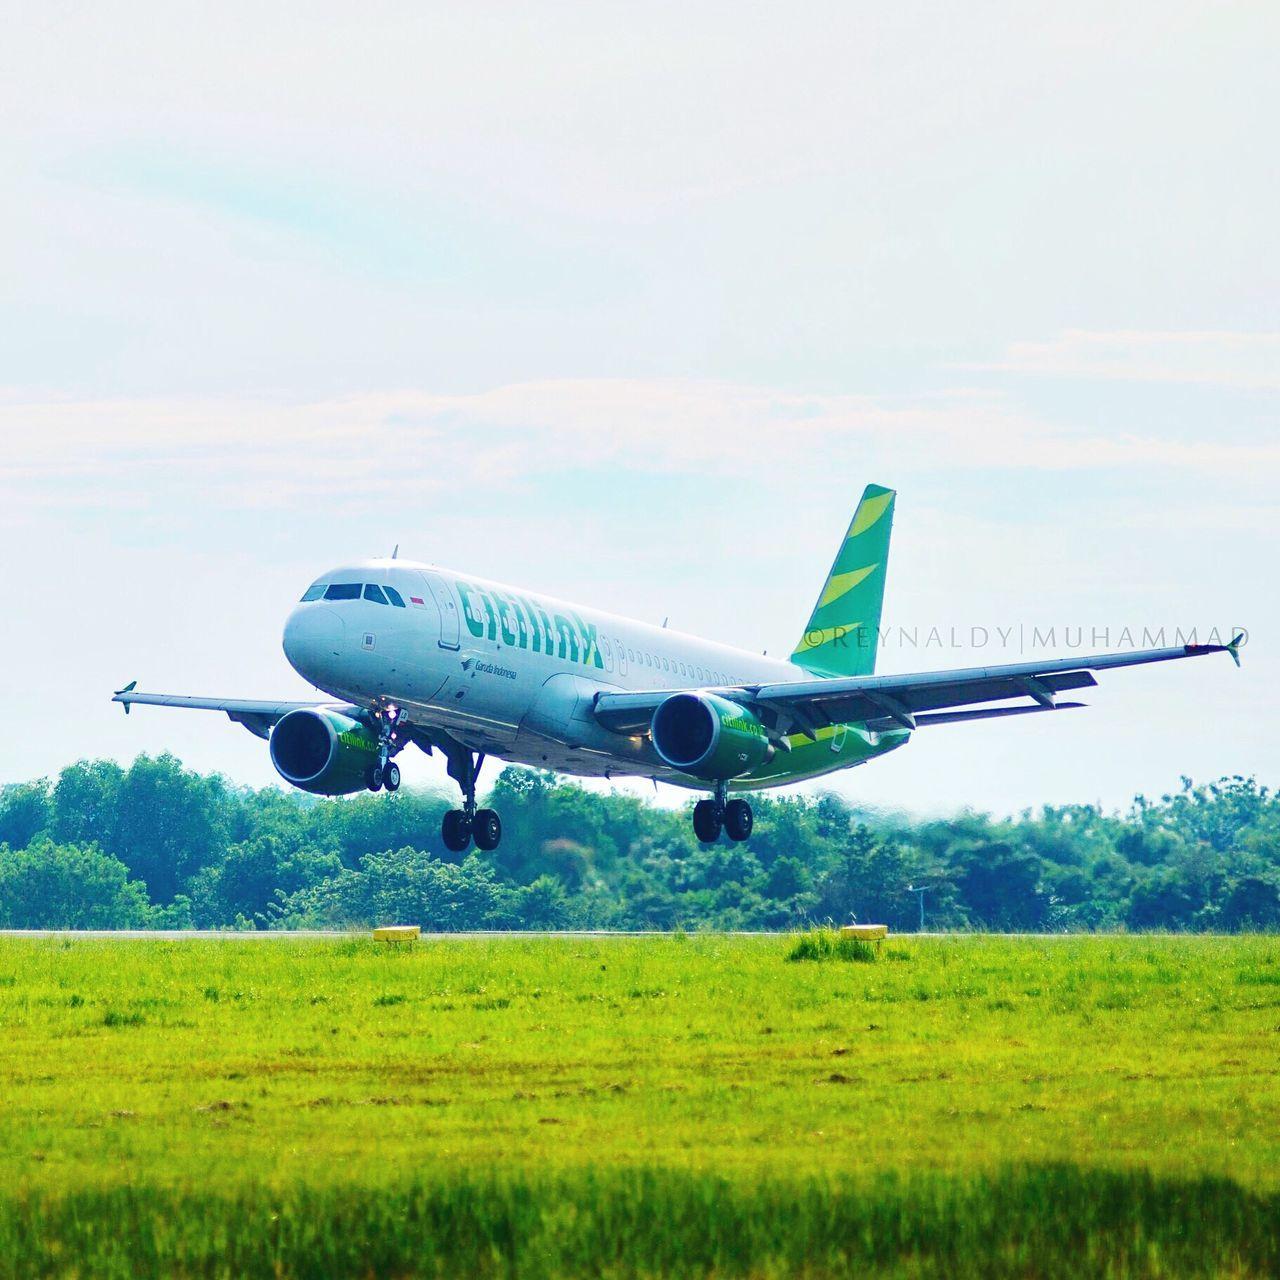 AIRPLANE FLYING OVER RUNWAY